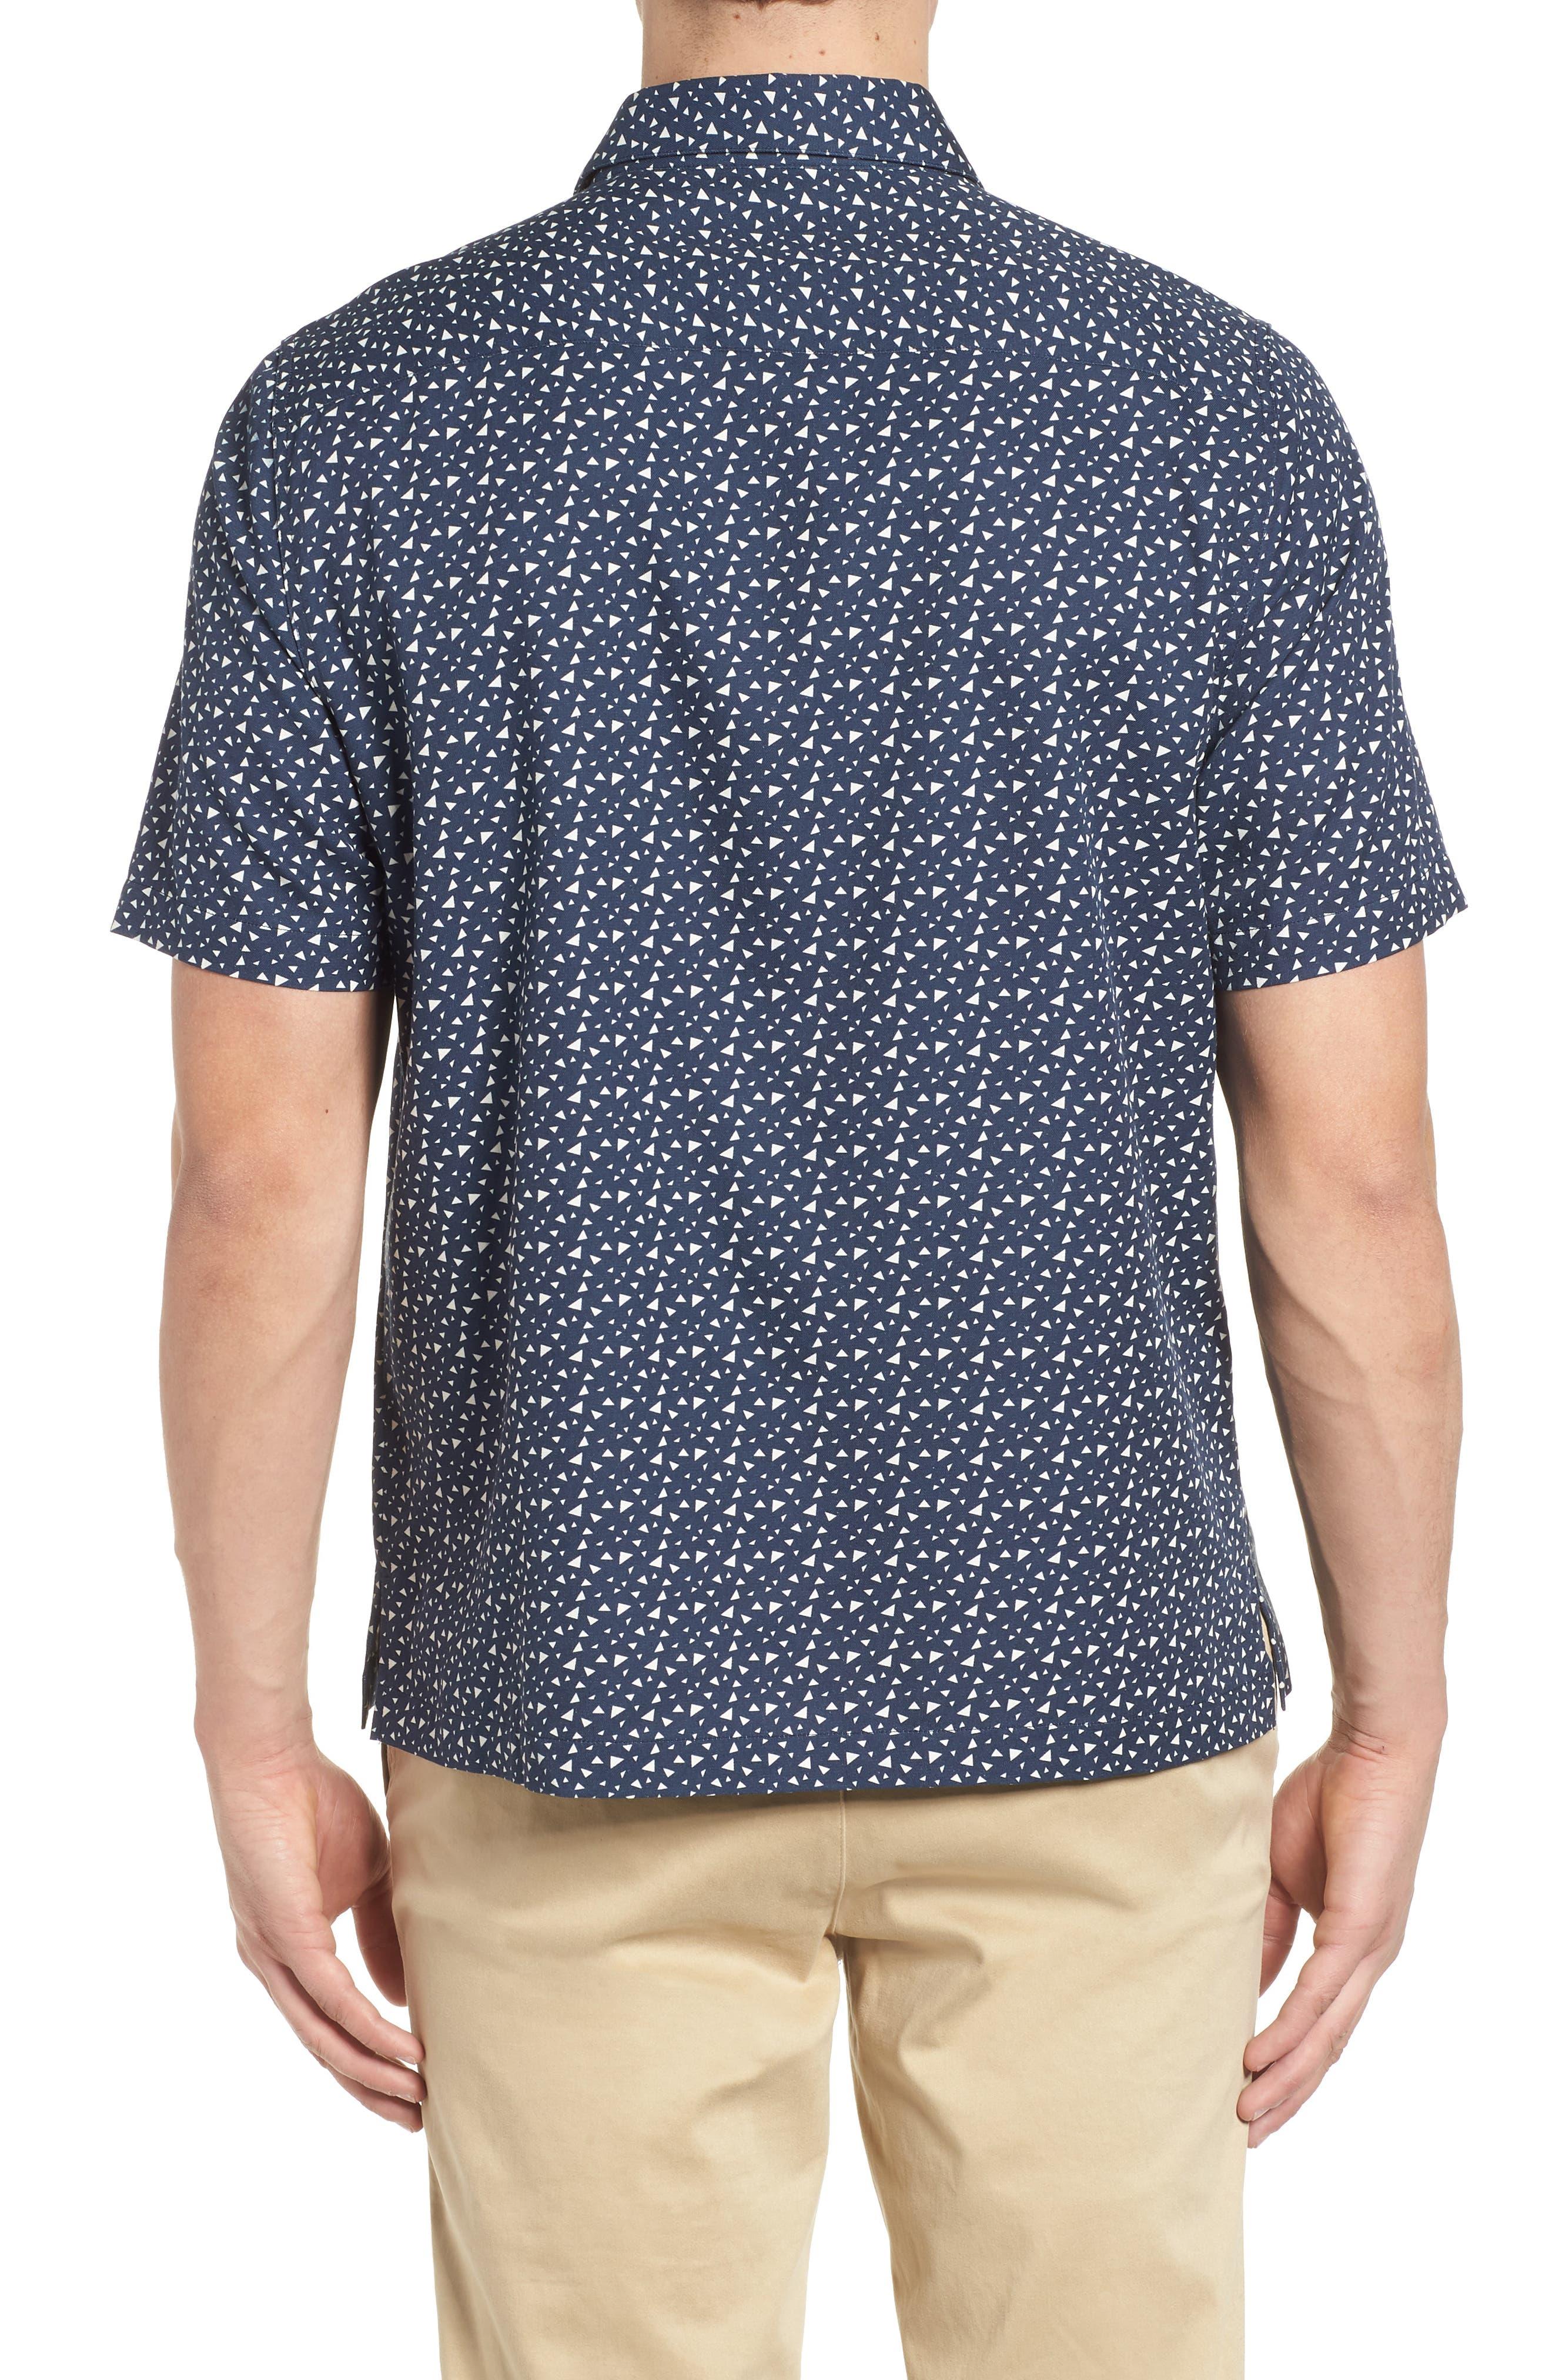 Bermuda Triangle Camp Shirt,                             Alternate thumbnail 2, color,                             Nat Blue